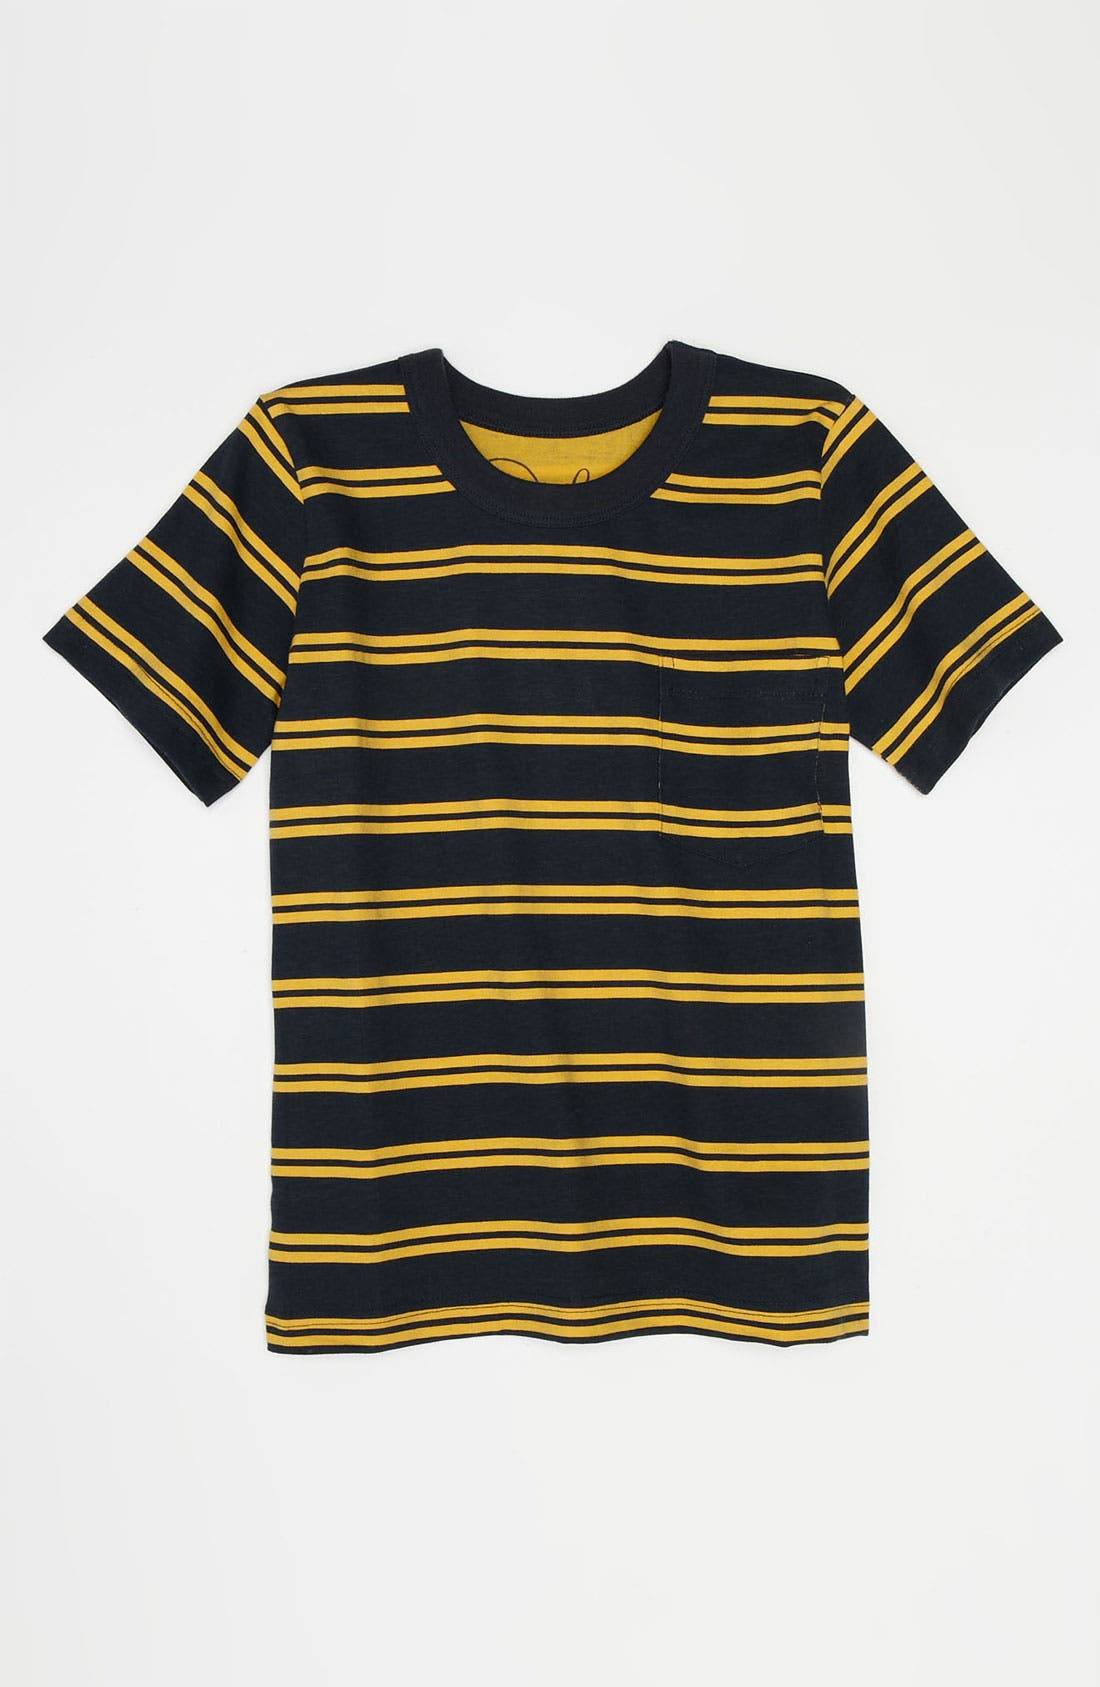 Main Image - Peek 'Simon' Stripe T-Shirt (Toddler, Little Boys & Big Boys)